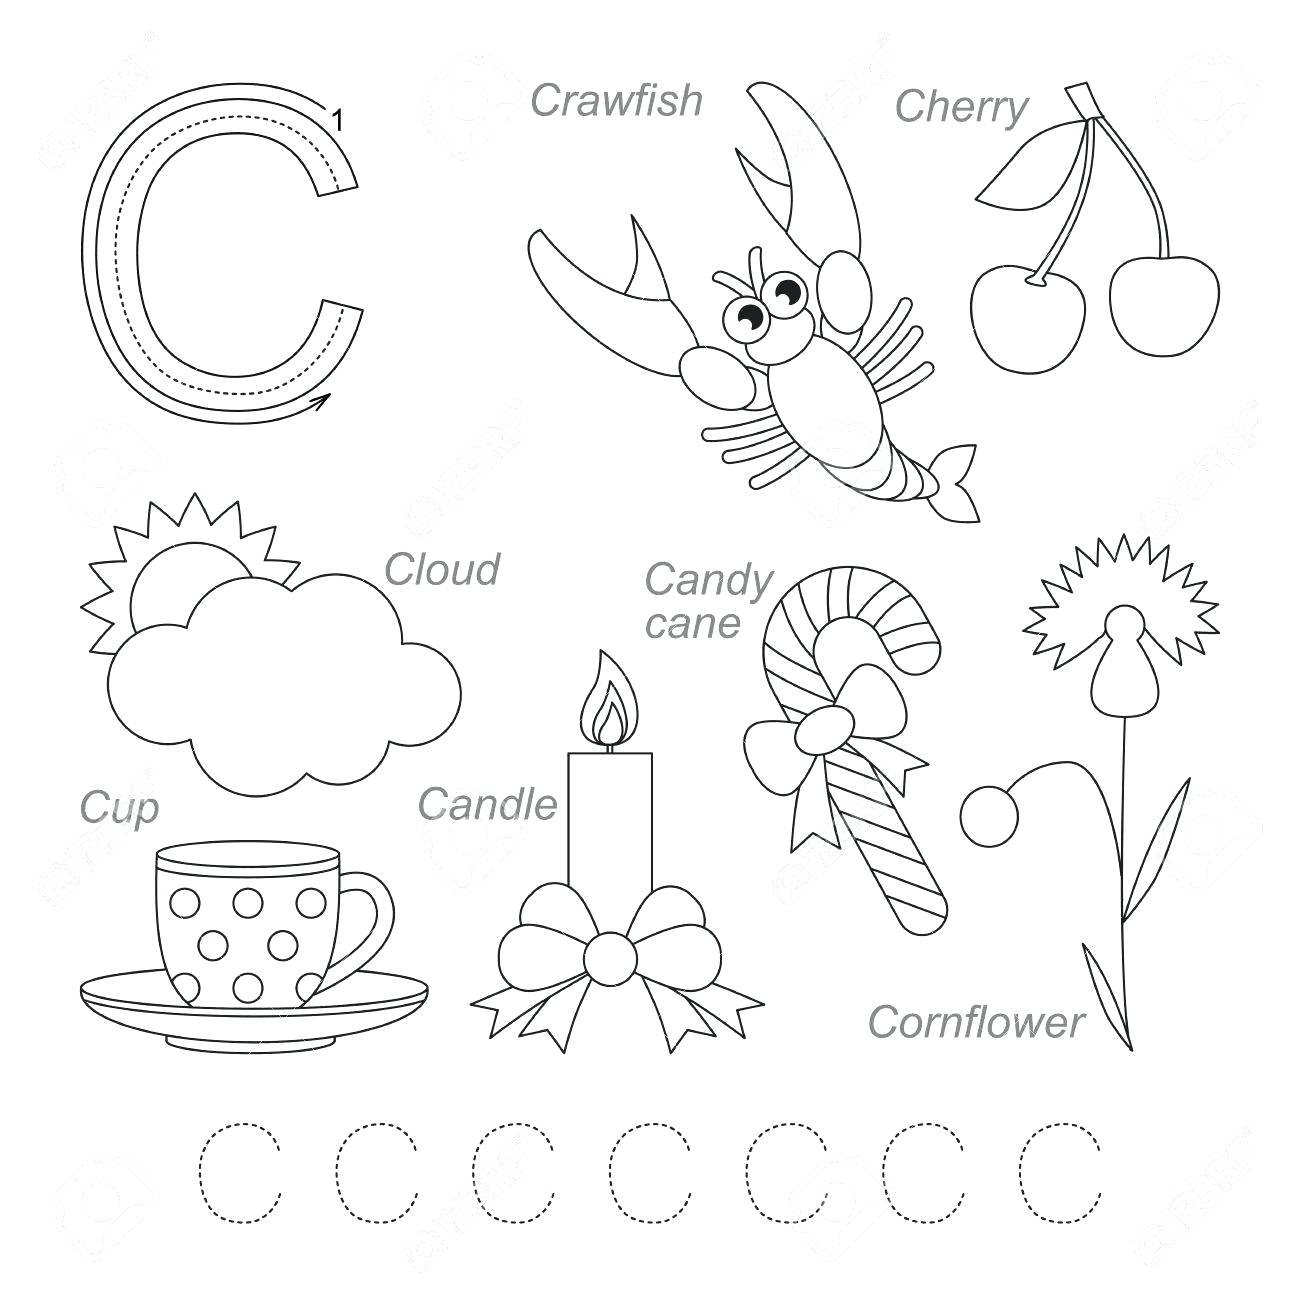 Letter C Worksheets To Printable. Letter C Worksheets - Misc pertaining to Letter C Worksheets Printable